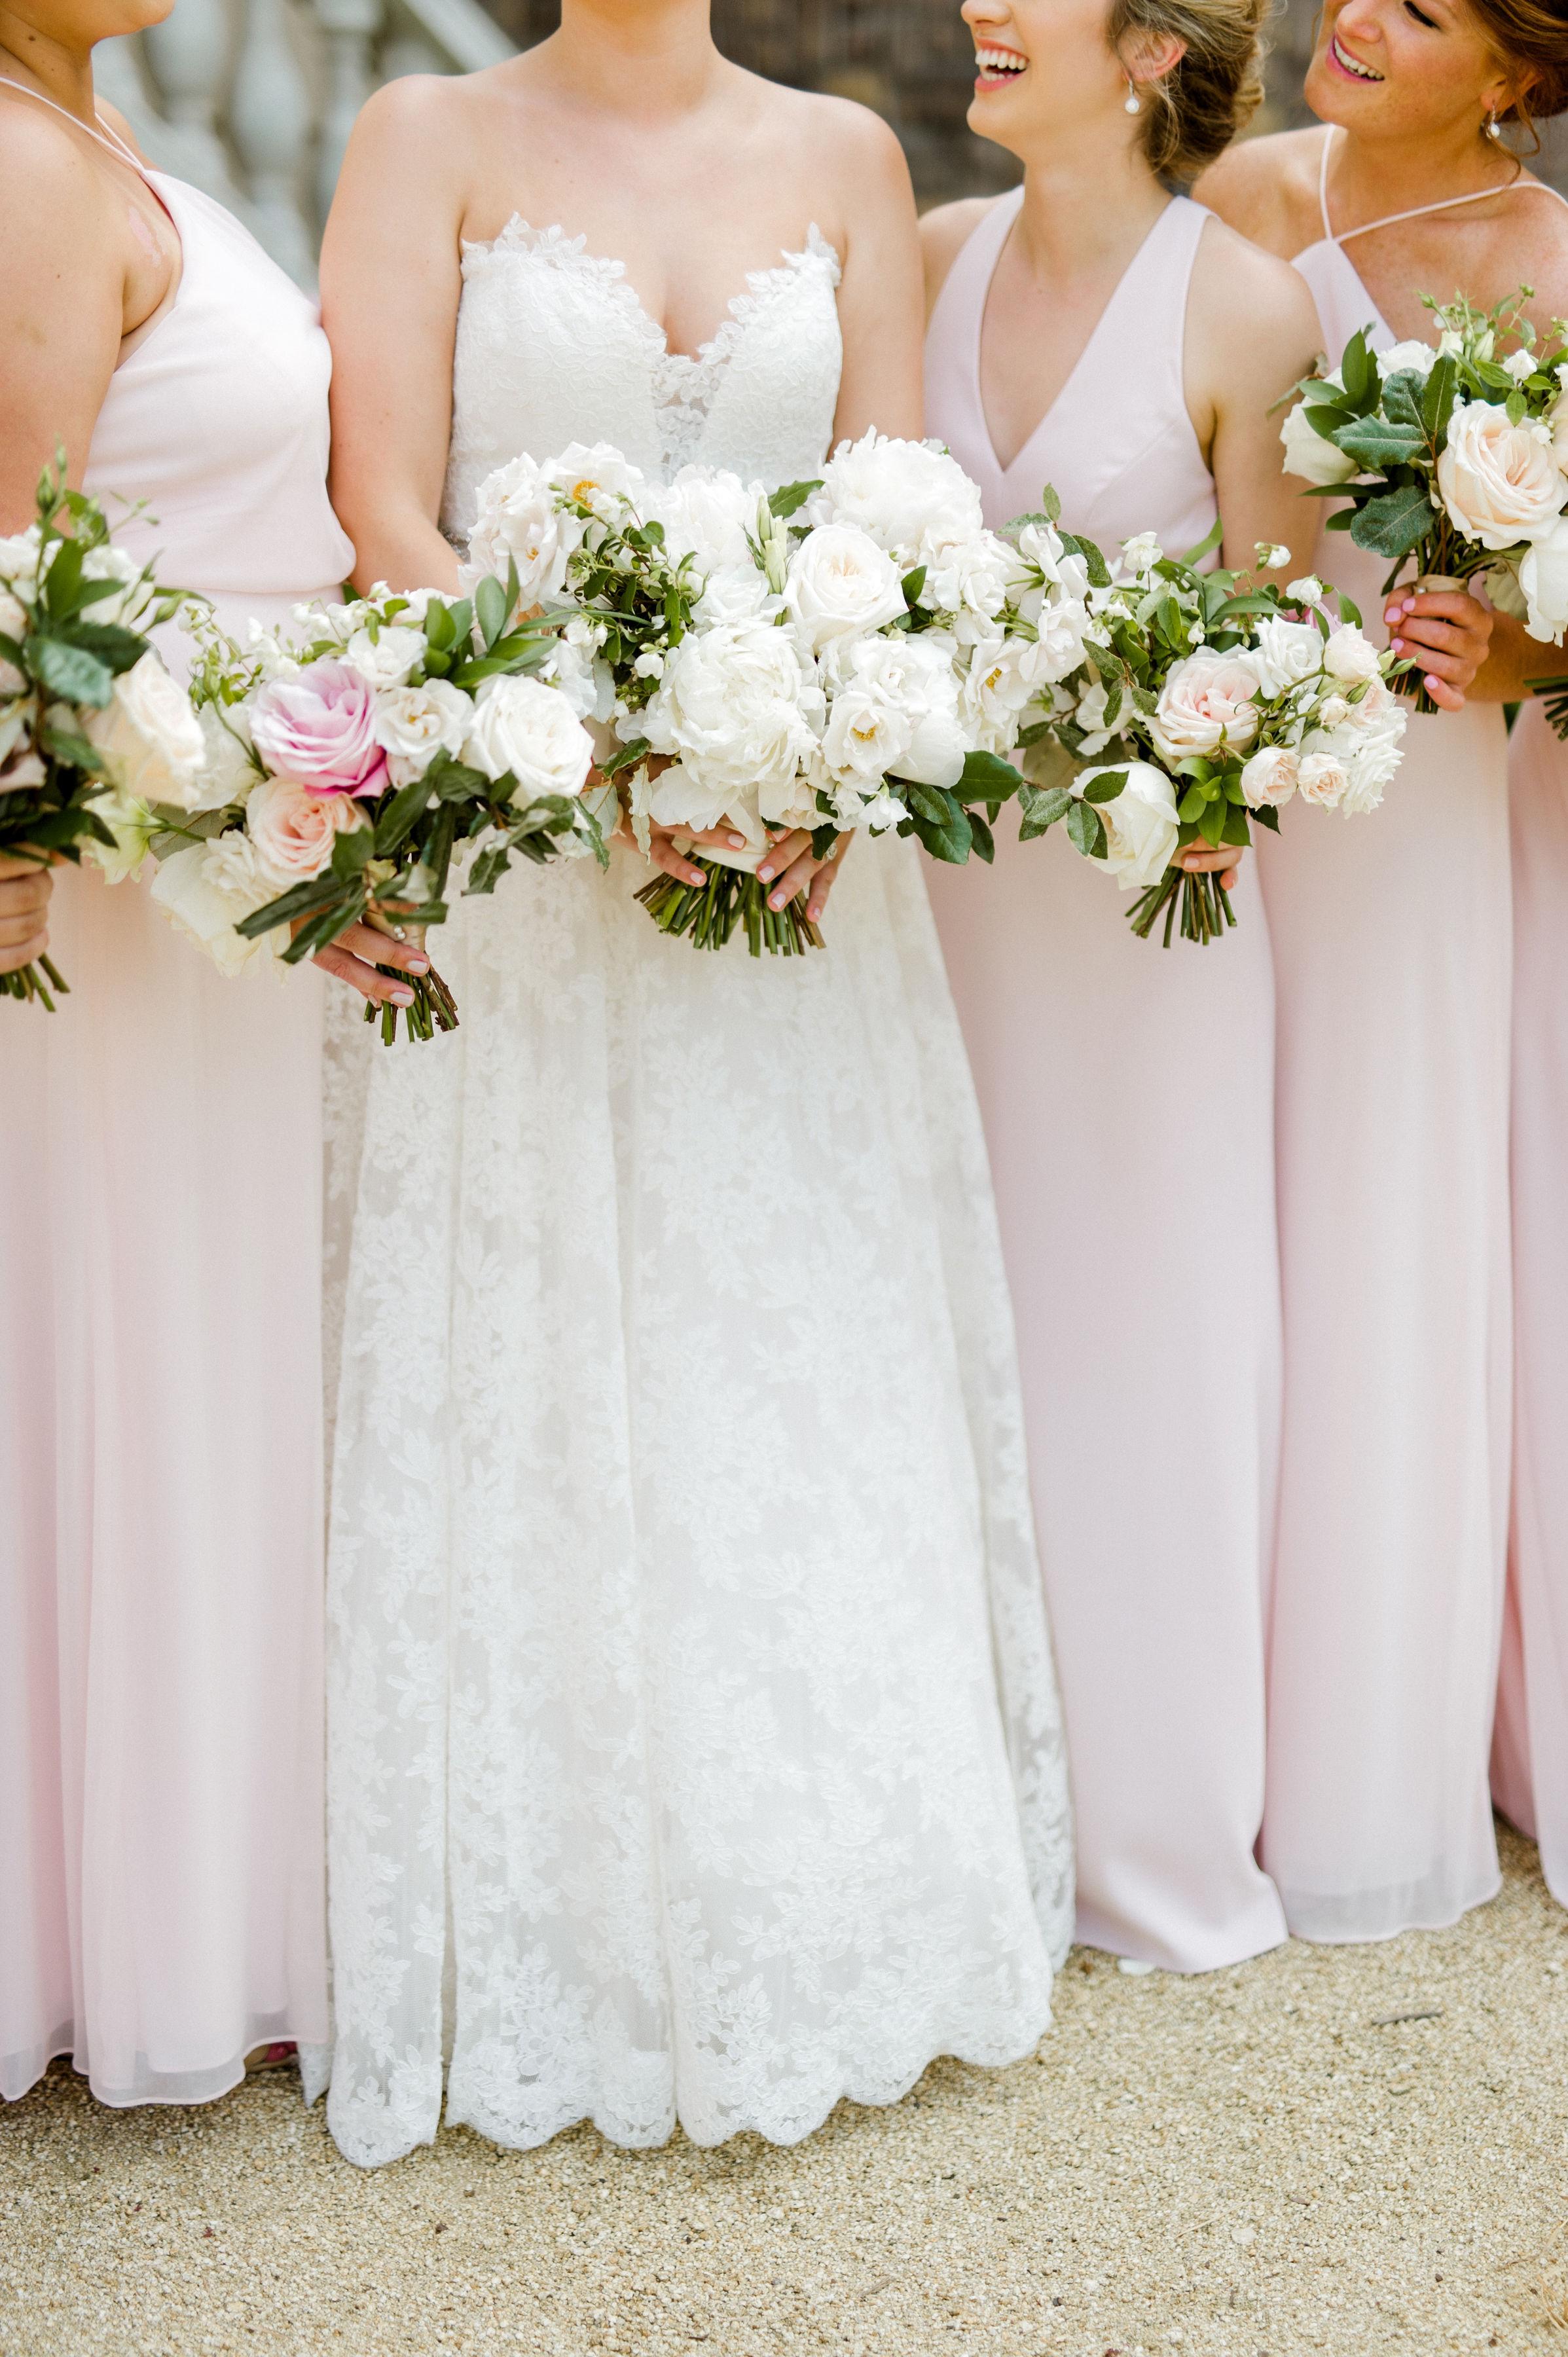 McElravey_Wedding_CarolineLimaPhotography_2018_174.jpg